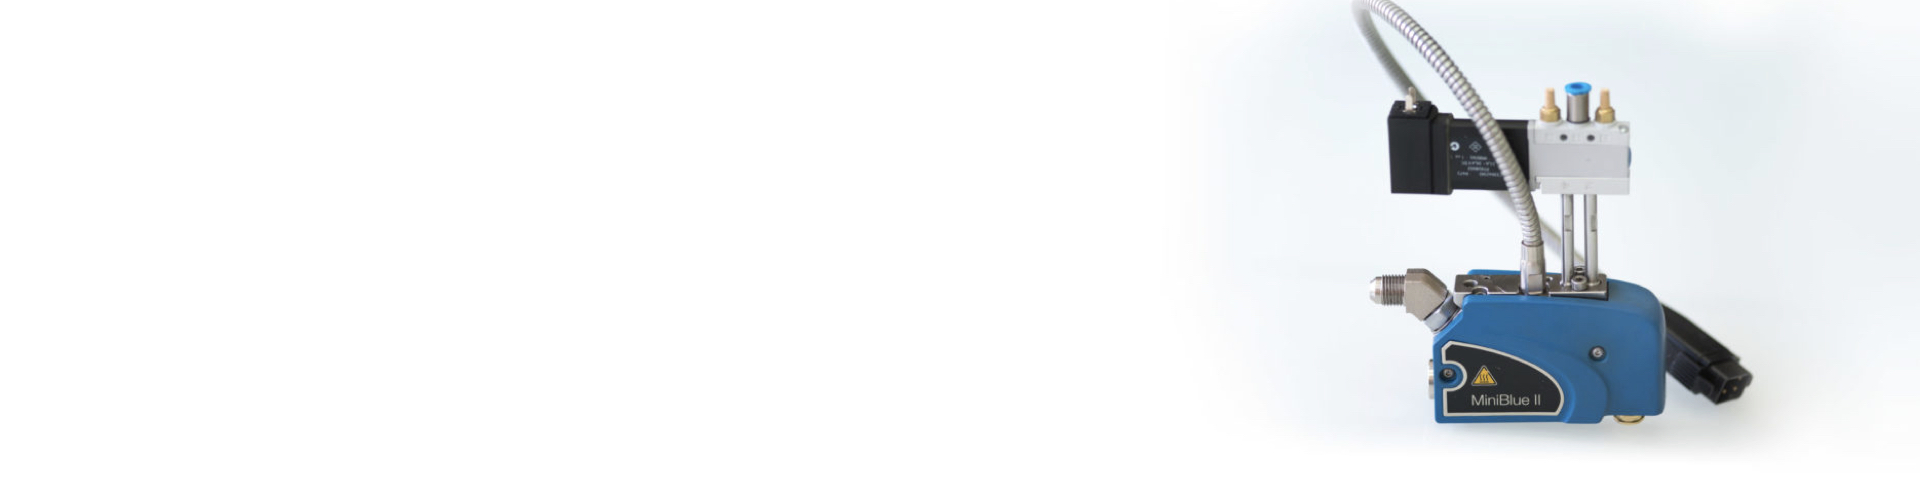 Aplikator Nordson MiniBlue